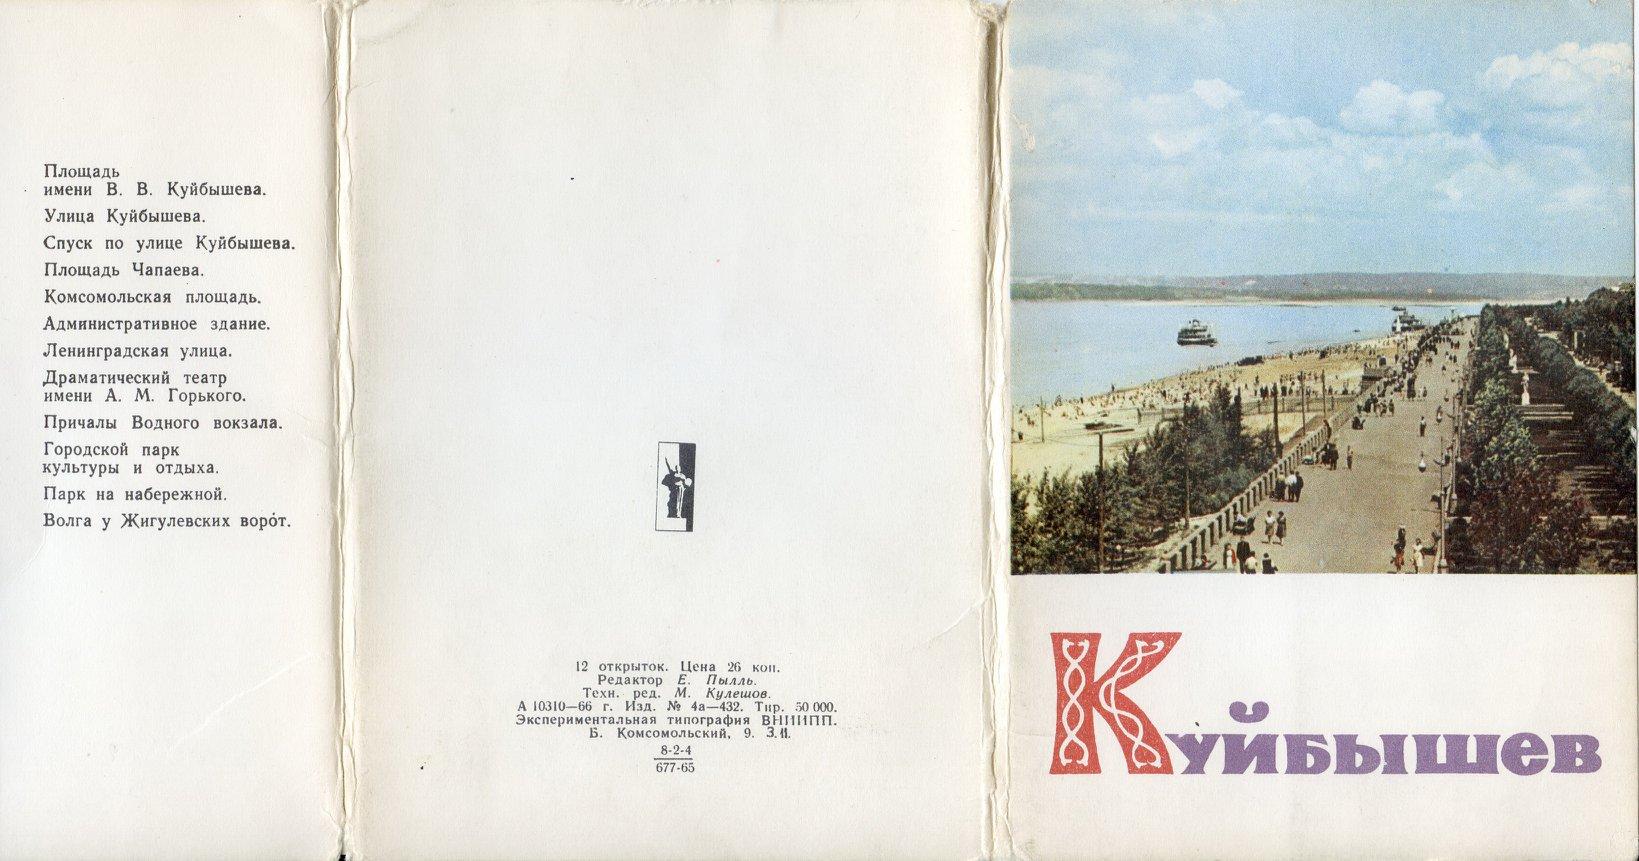 Открытки с видами Куйбышева